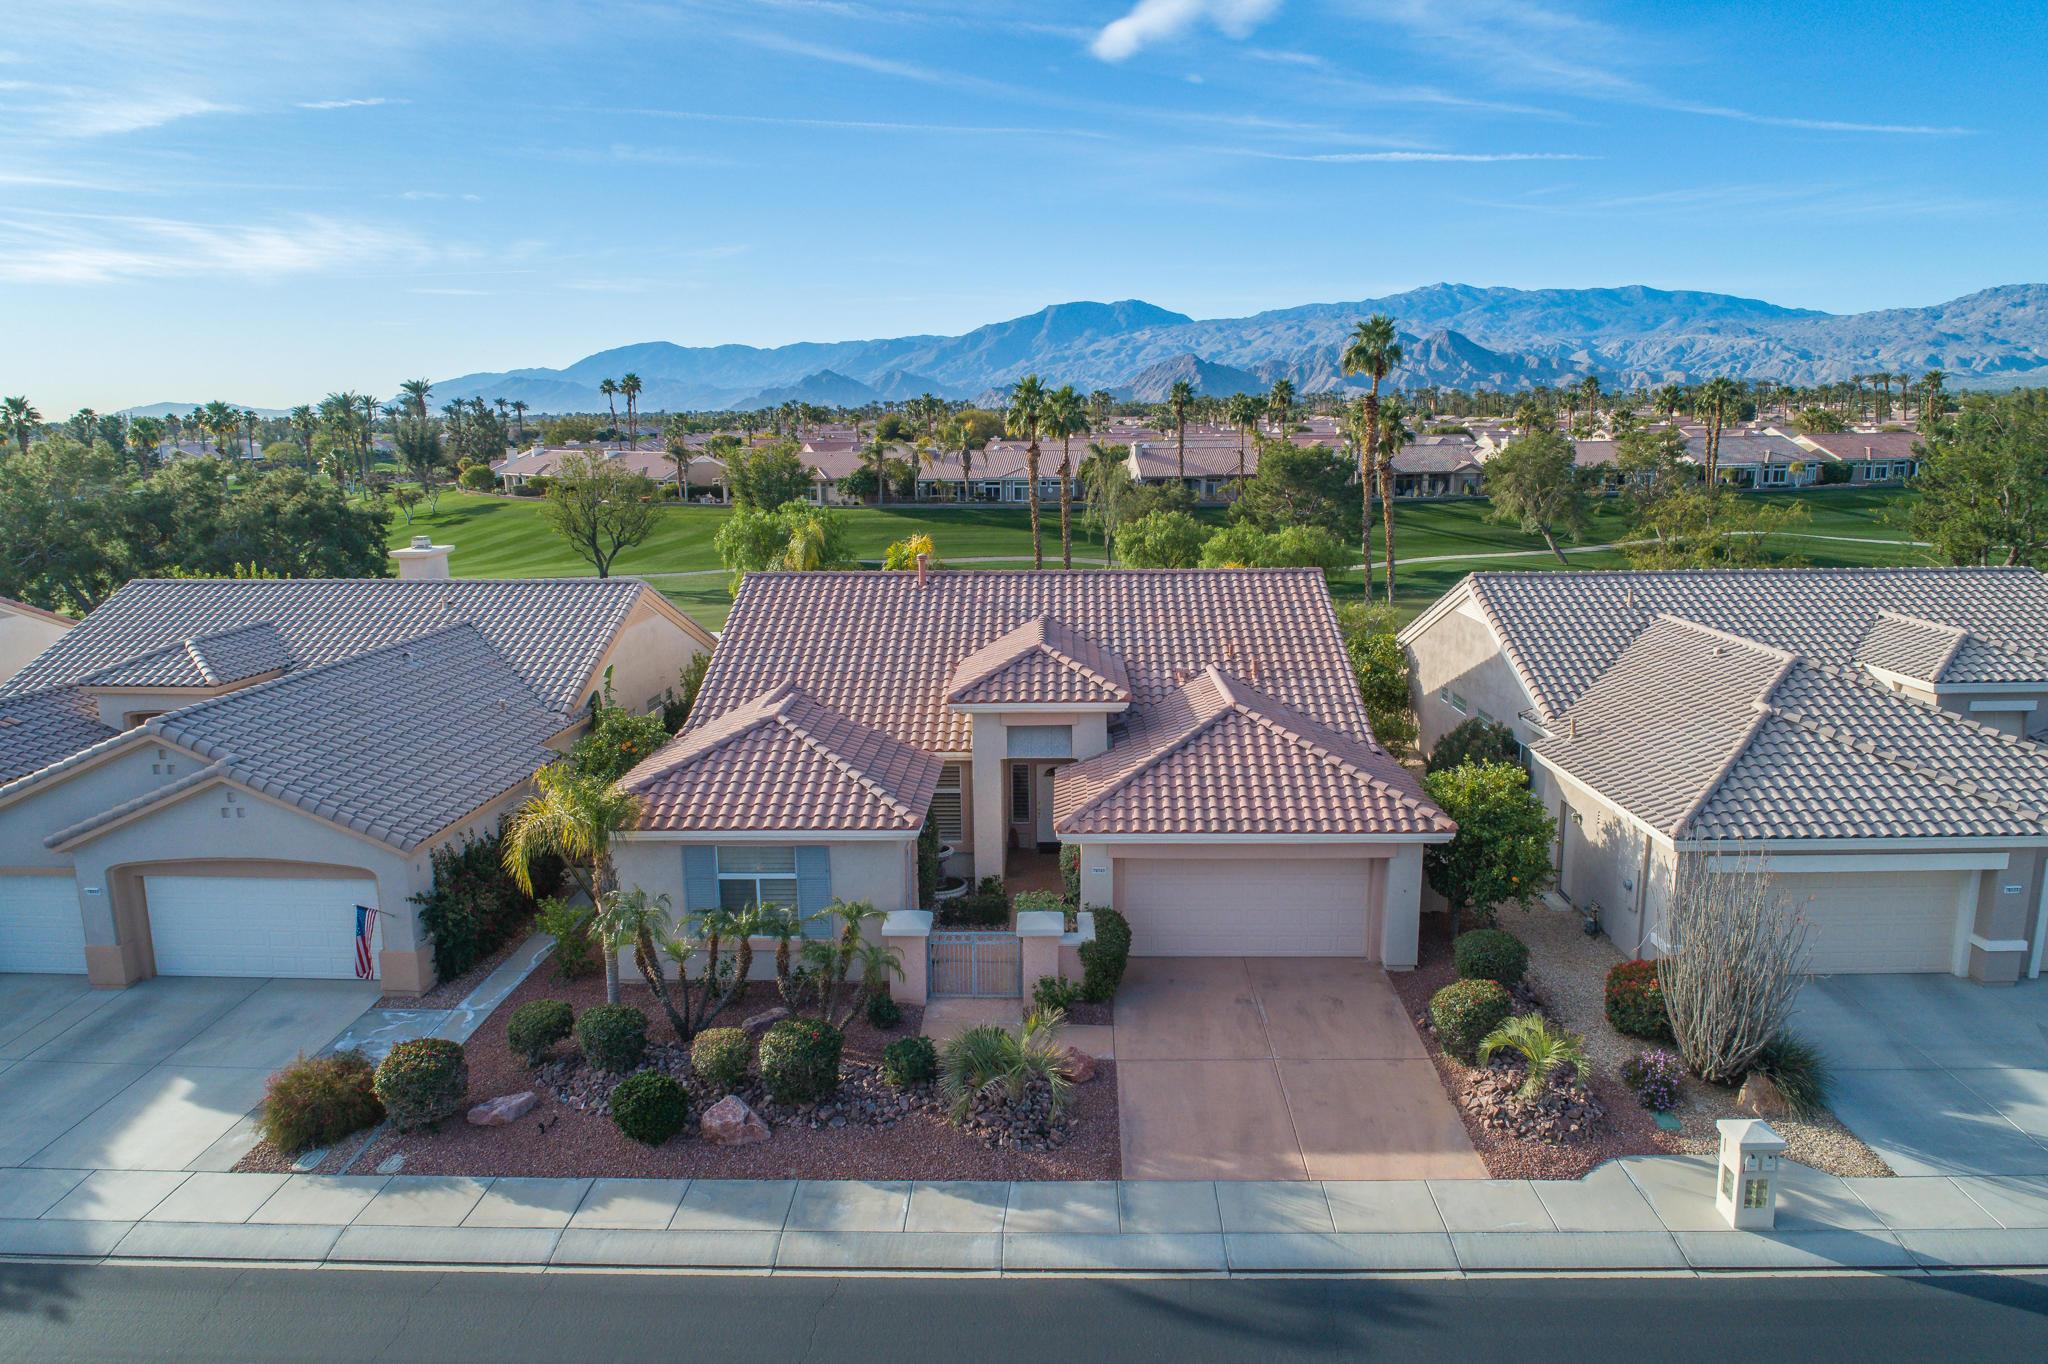 Photo of 78543 Sunrise Mountain View, Palm Desert, CA 92211